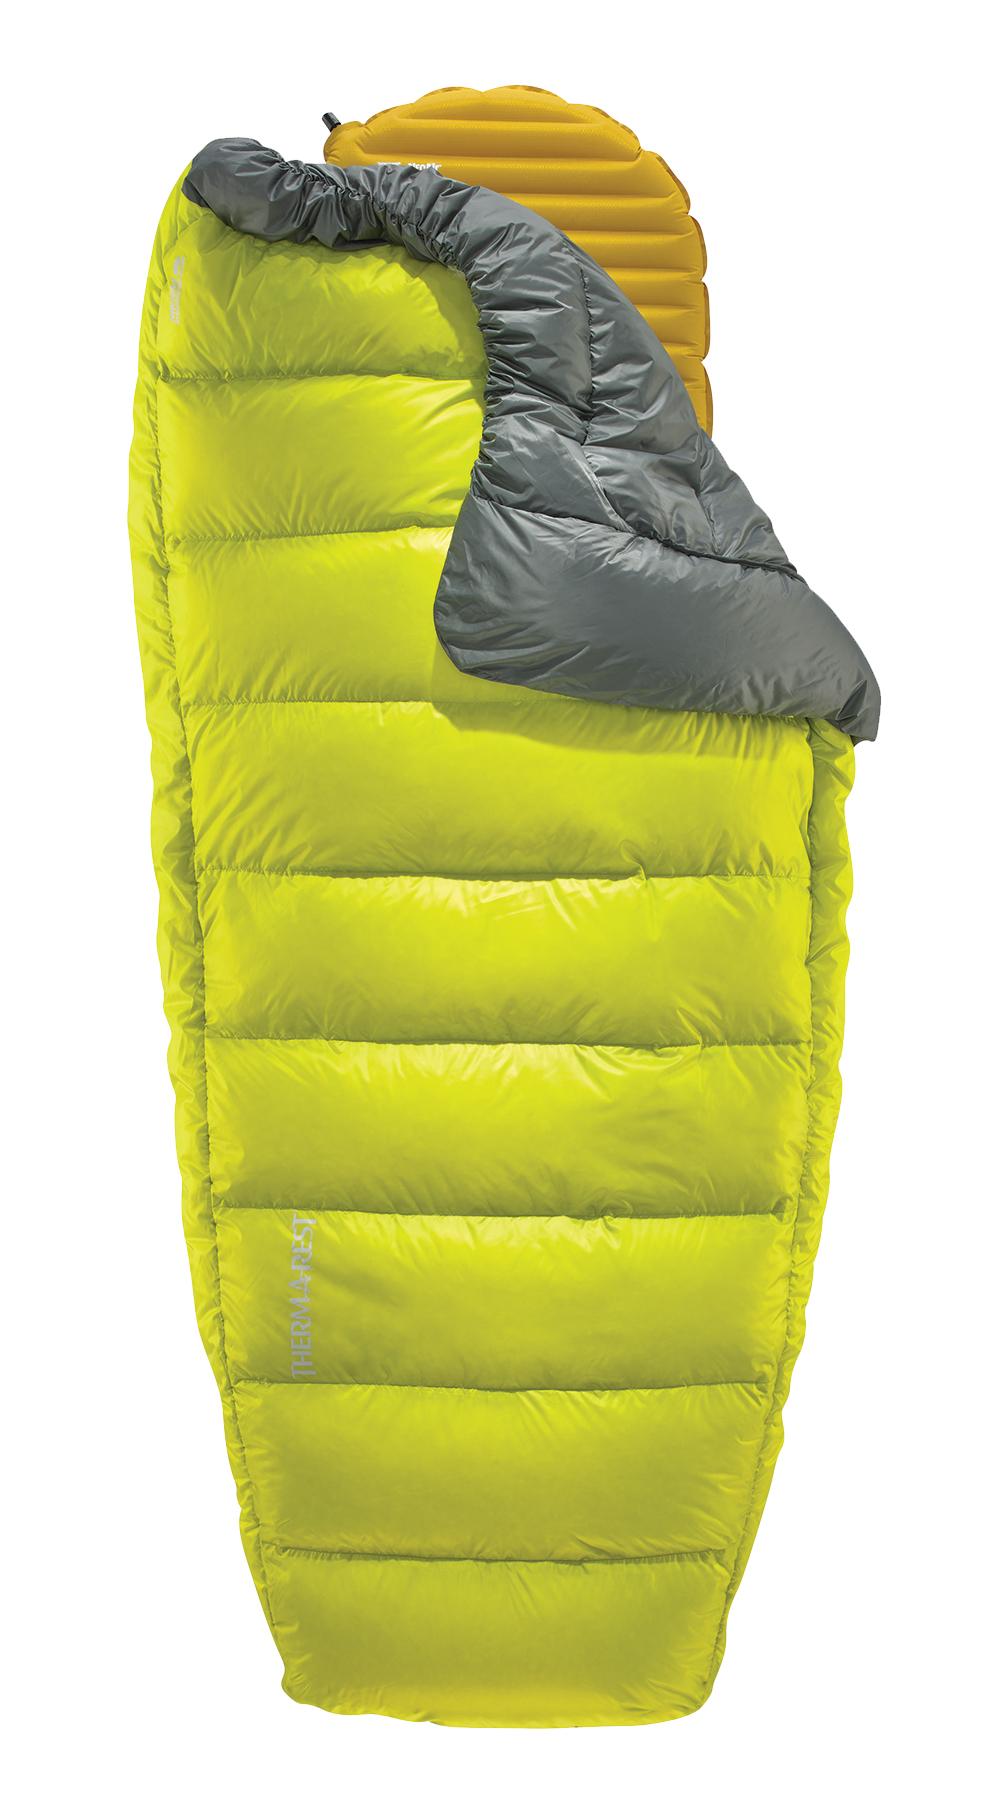 Camping Blankets And Quilts Matador Pocket Blanket 20 Alpine Green